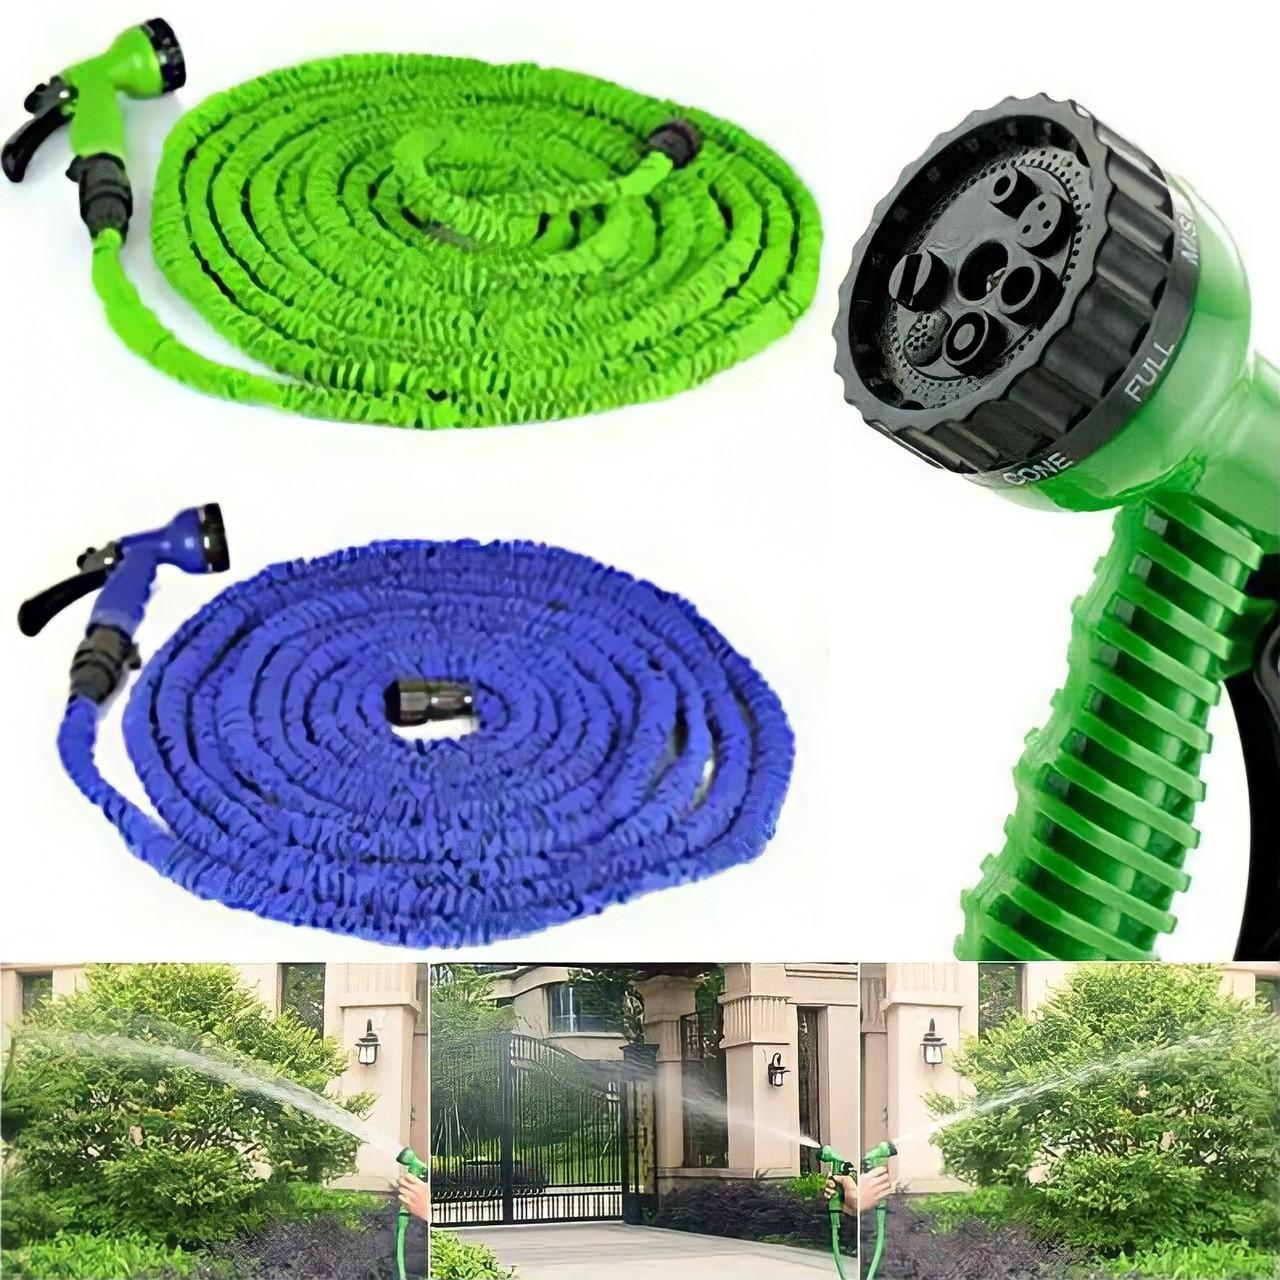 Шланг поливальний X-hose для саду 15 м | xhose шланг для поливу